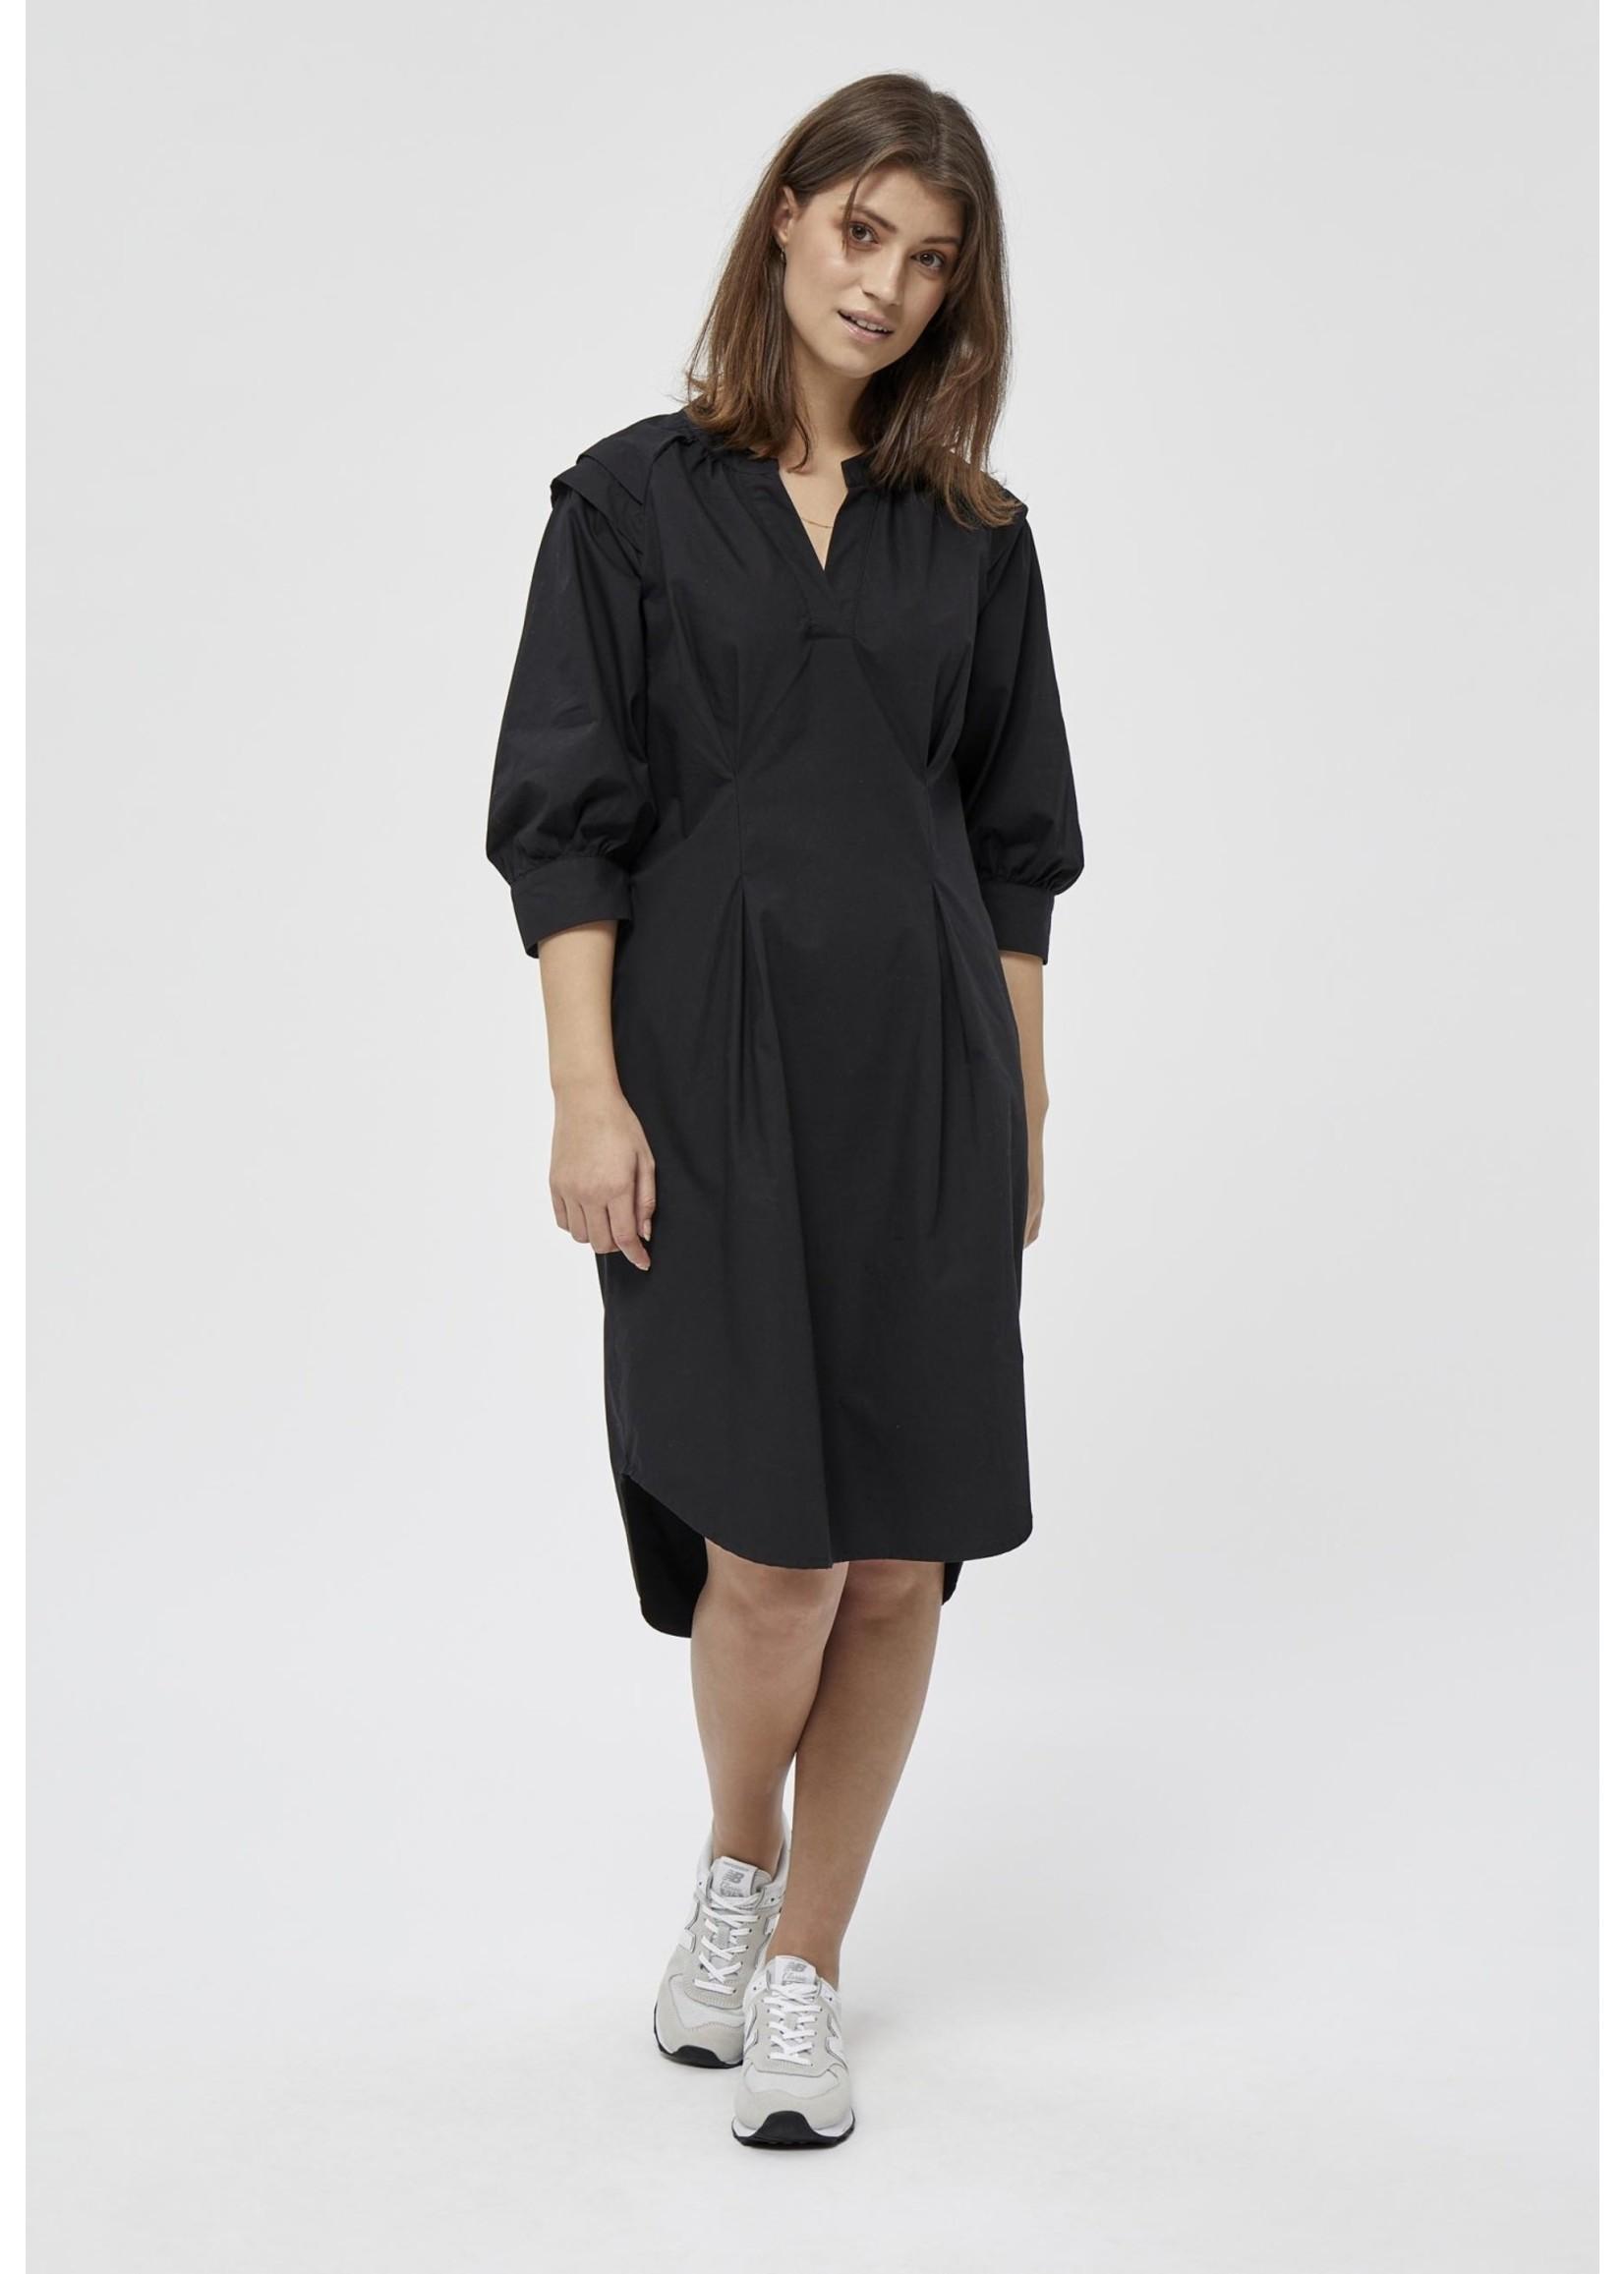 PEPPERCORN Perris Dress BLACK